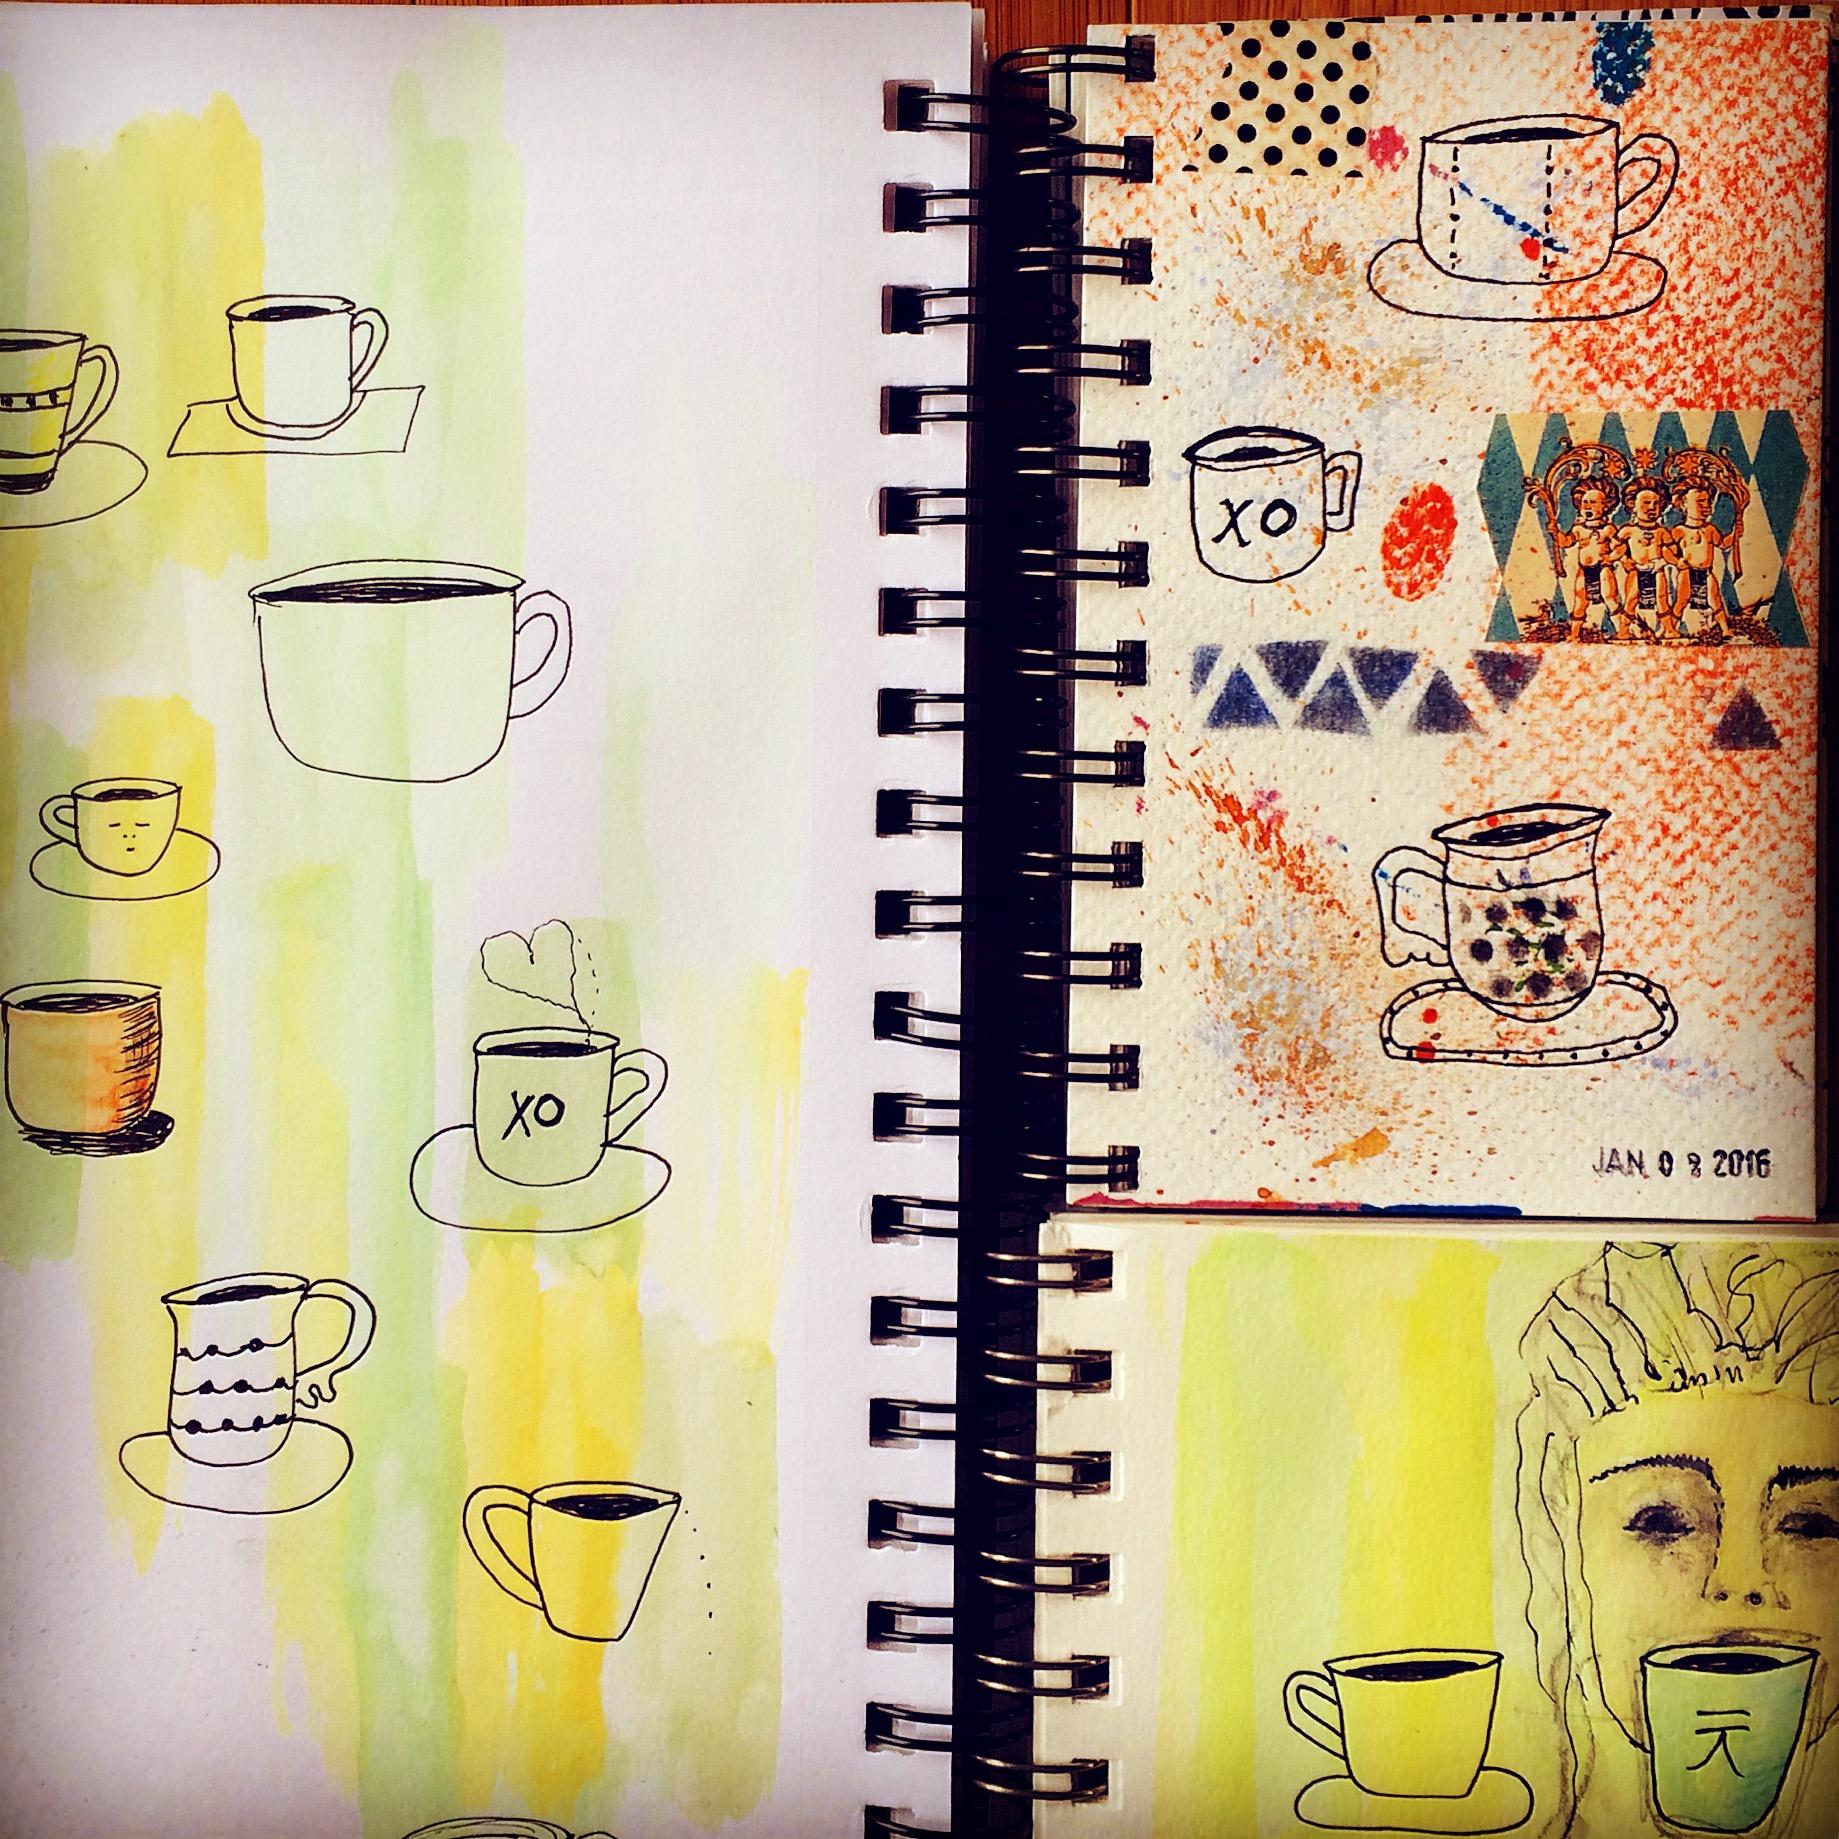 January 2 Topic: Teacup